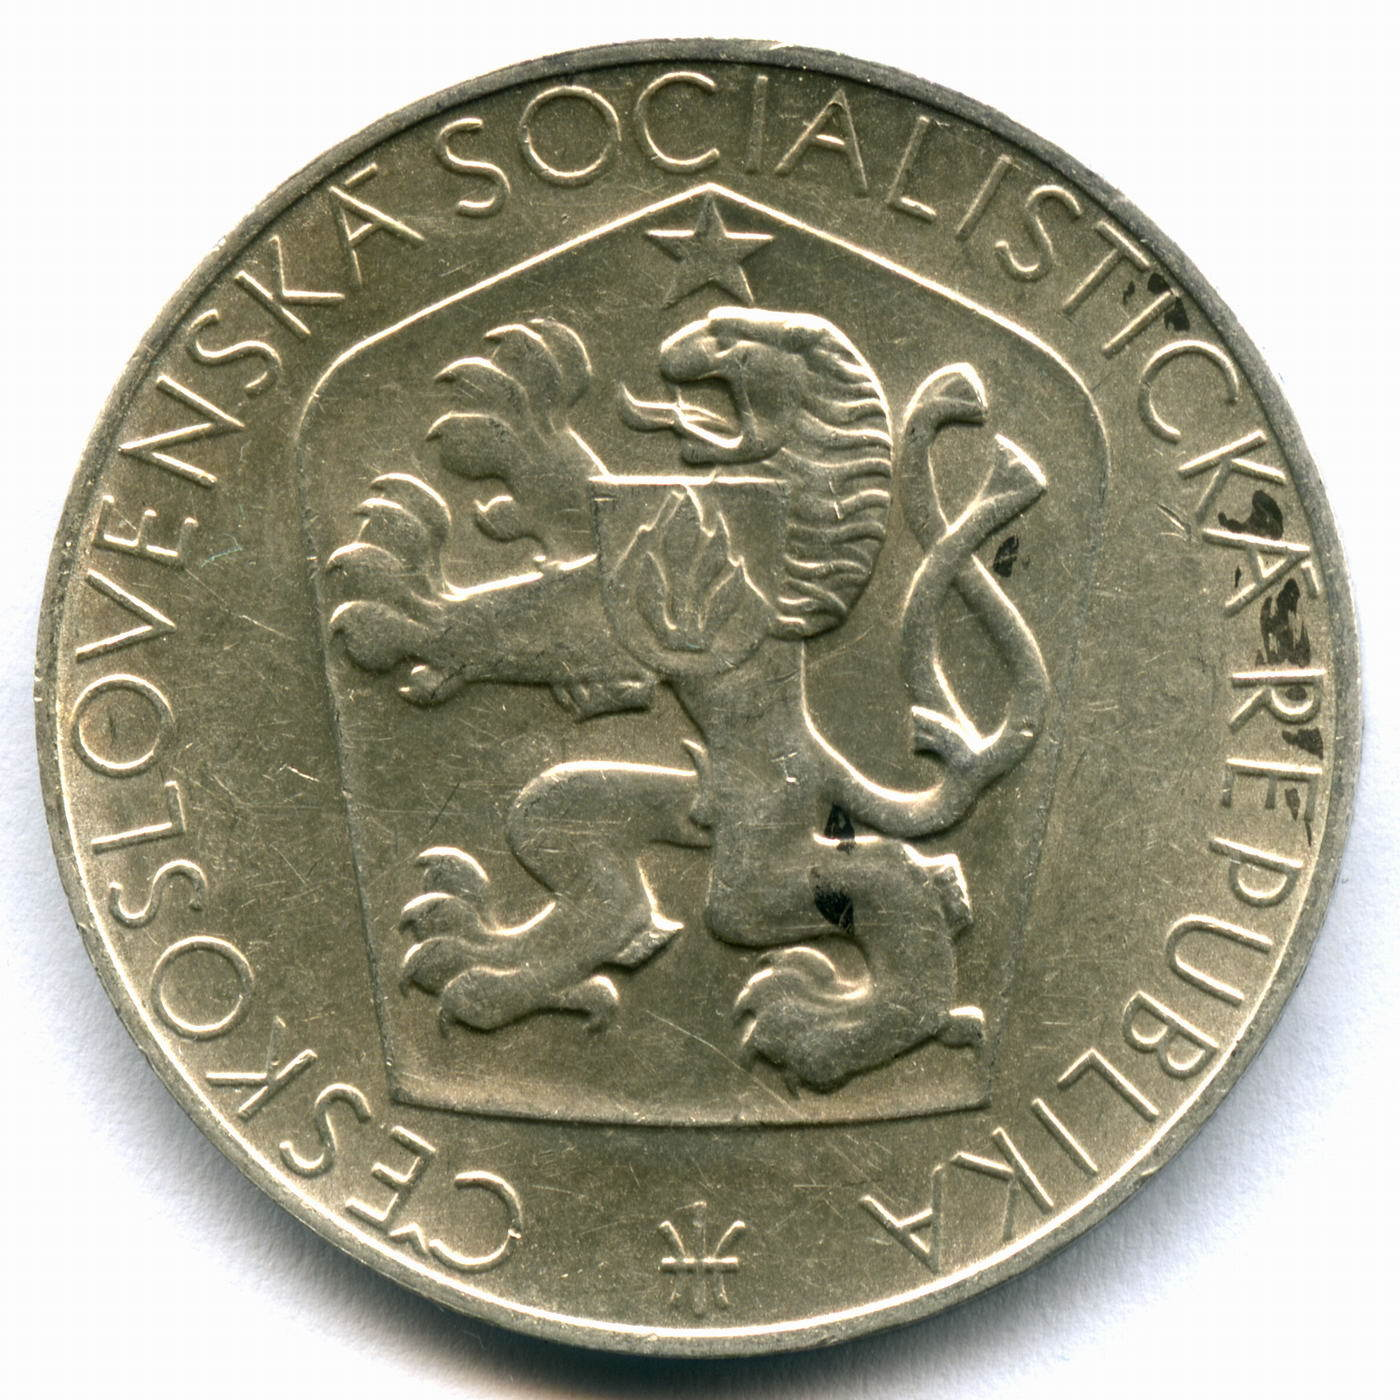 25 крон 1965. Чехословакия (20 лет освобождения ЧССР от фашизма). Серебро XF